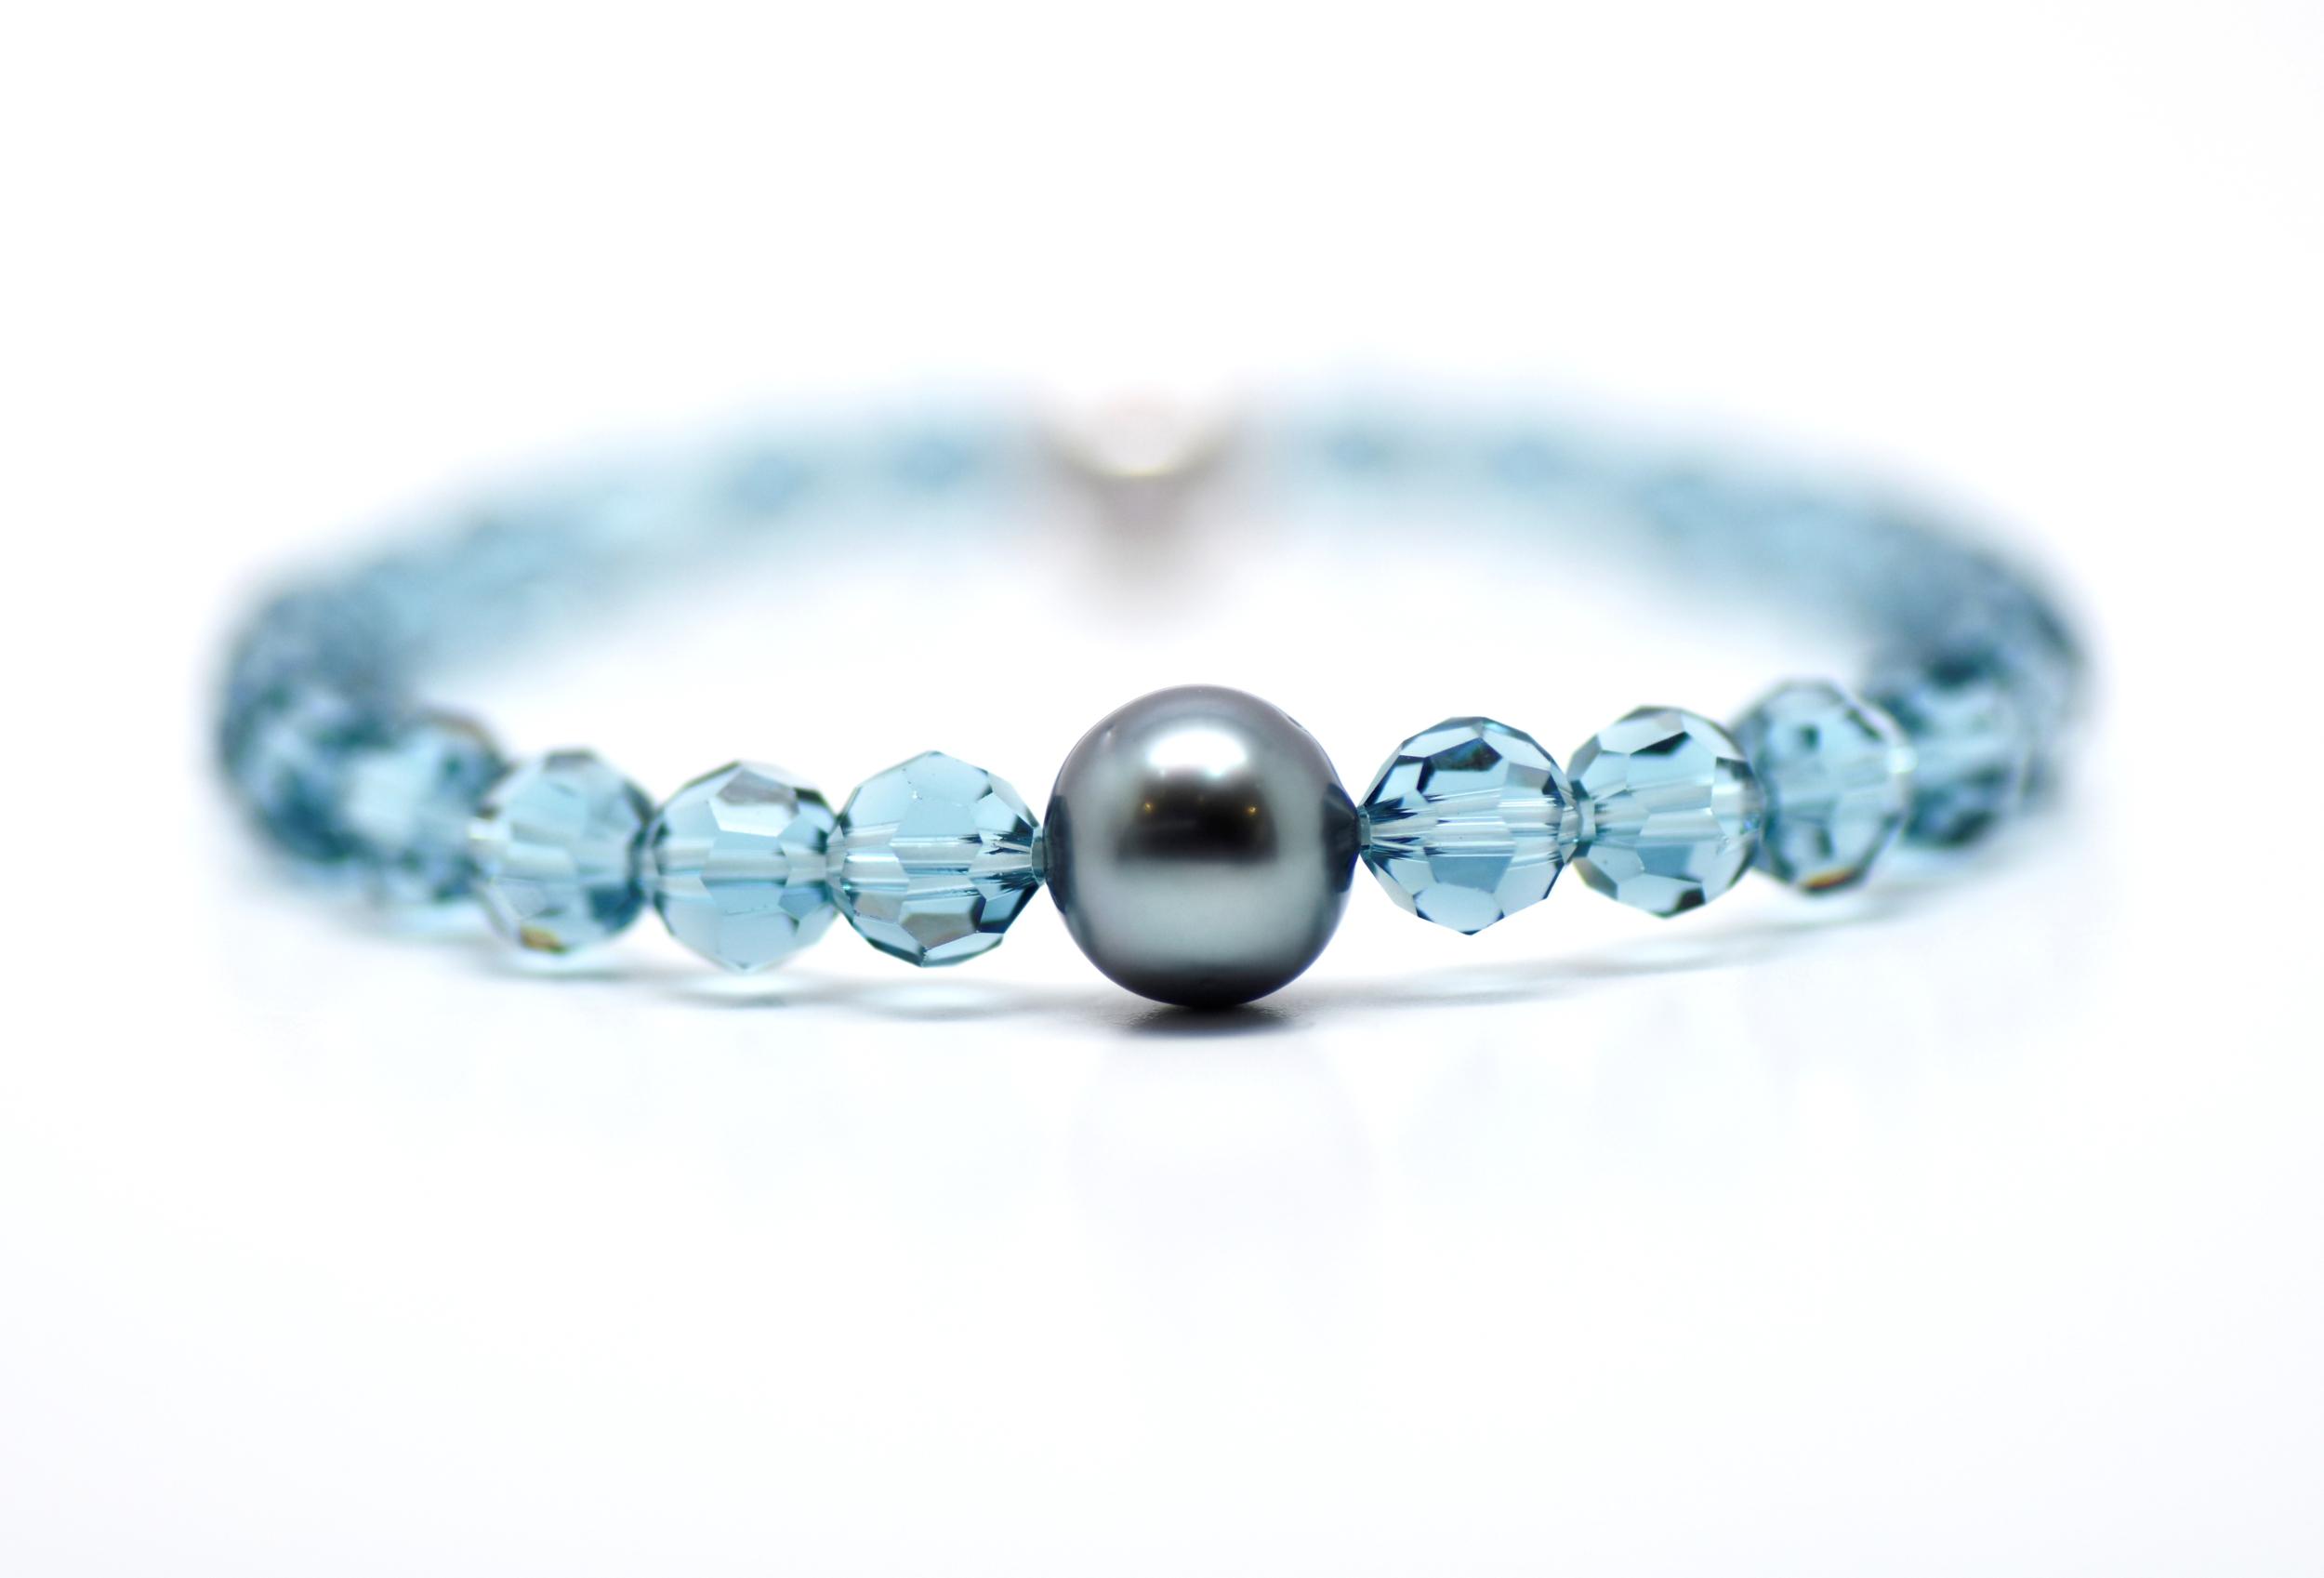 Manhattan indian blue 6 mm swarovski beads and 1 Tahiti pearl bracelet